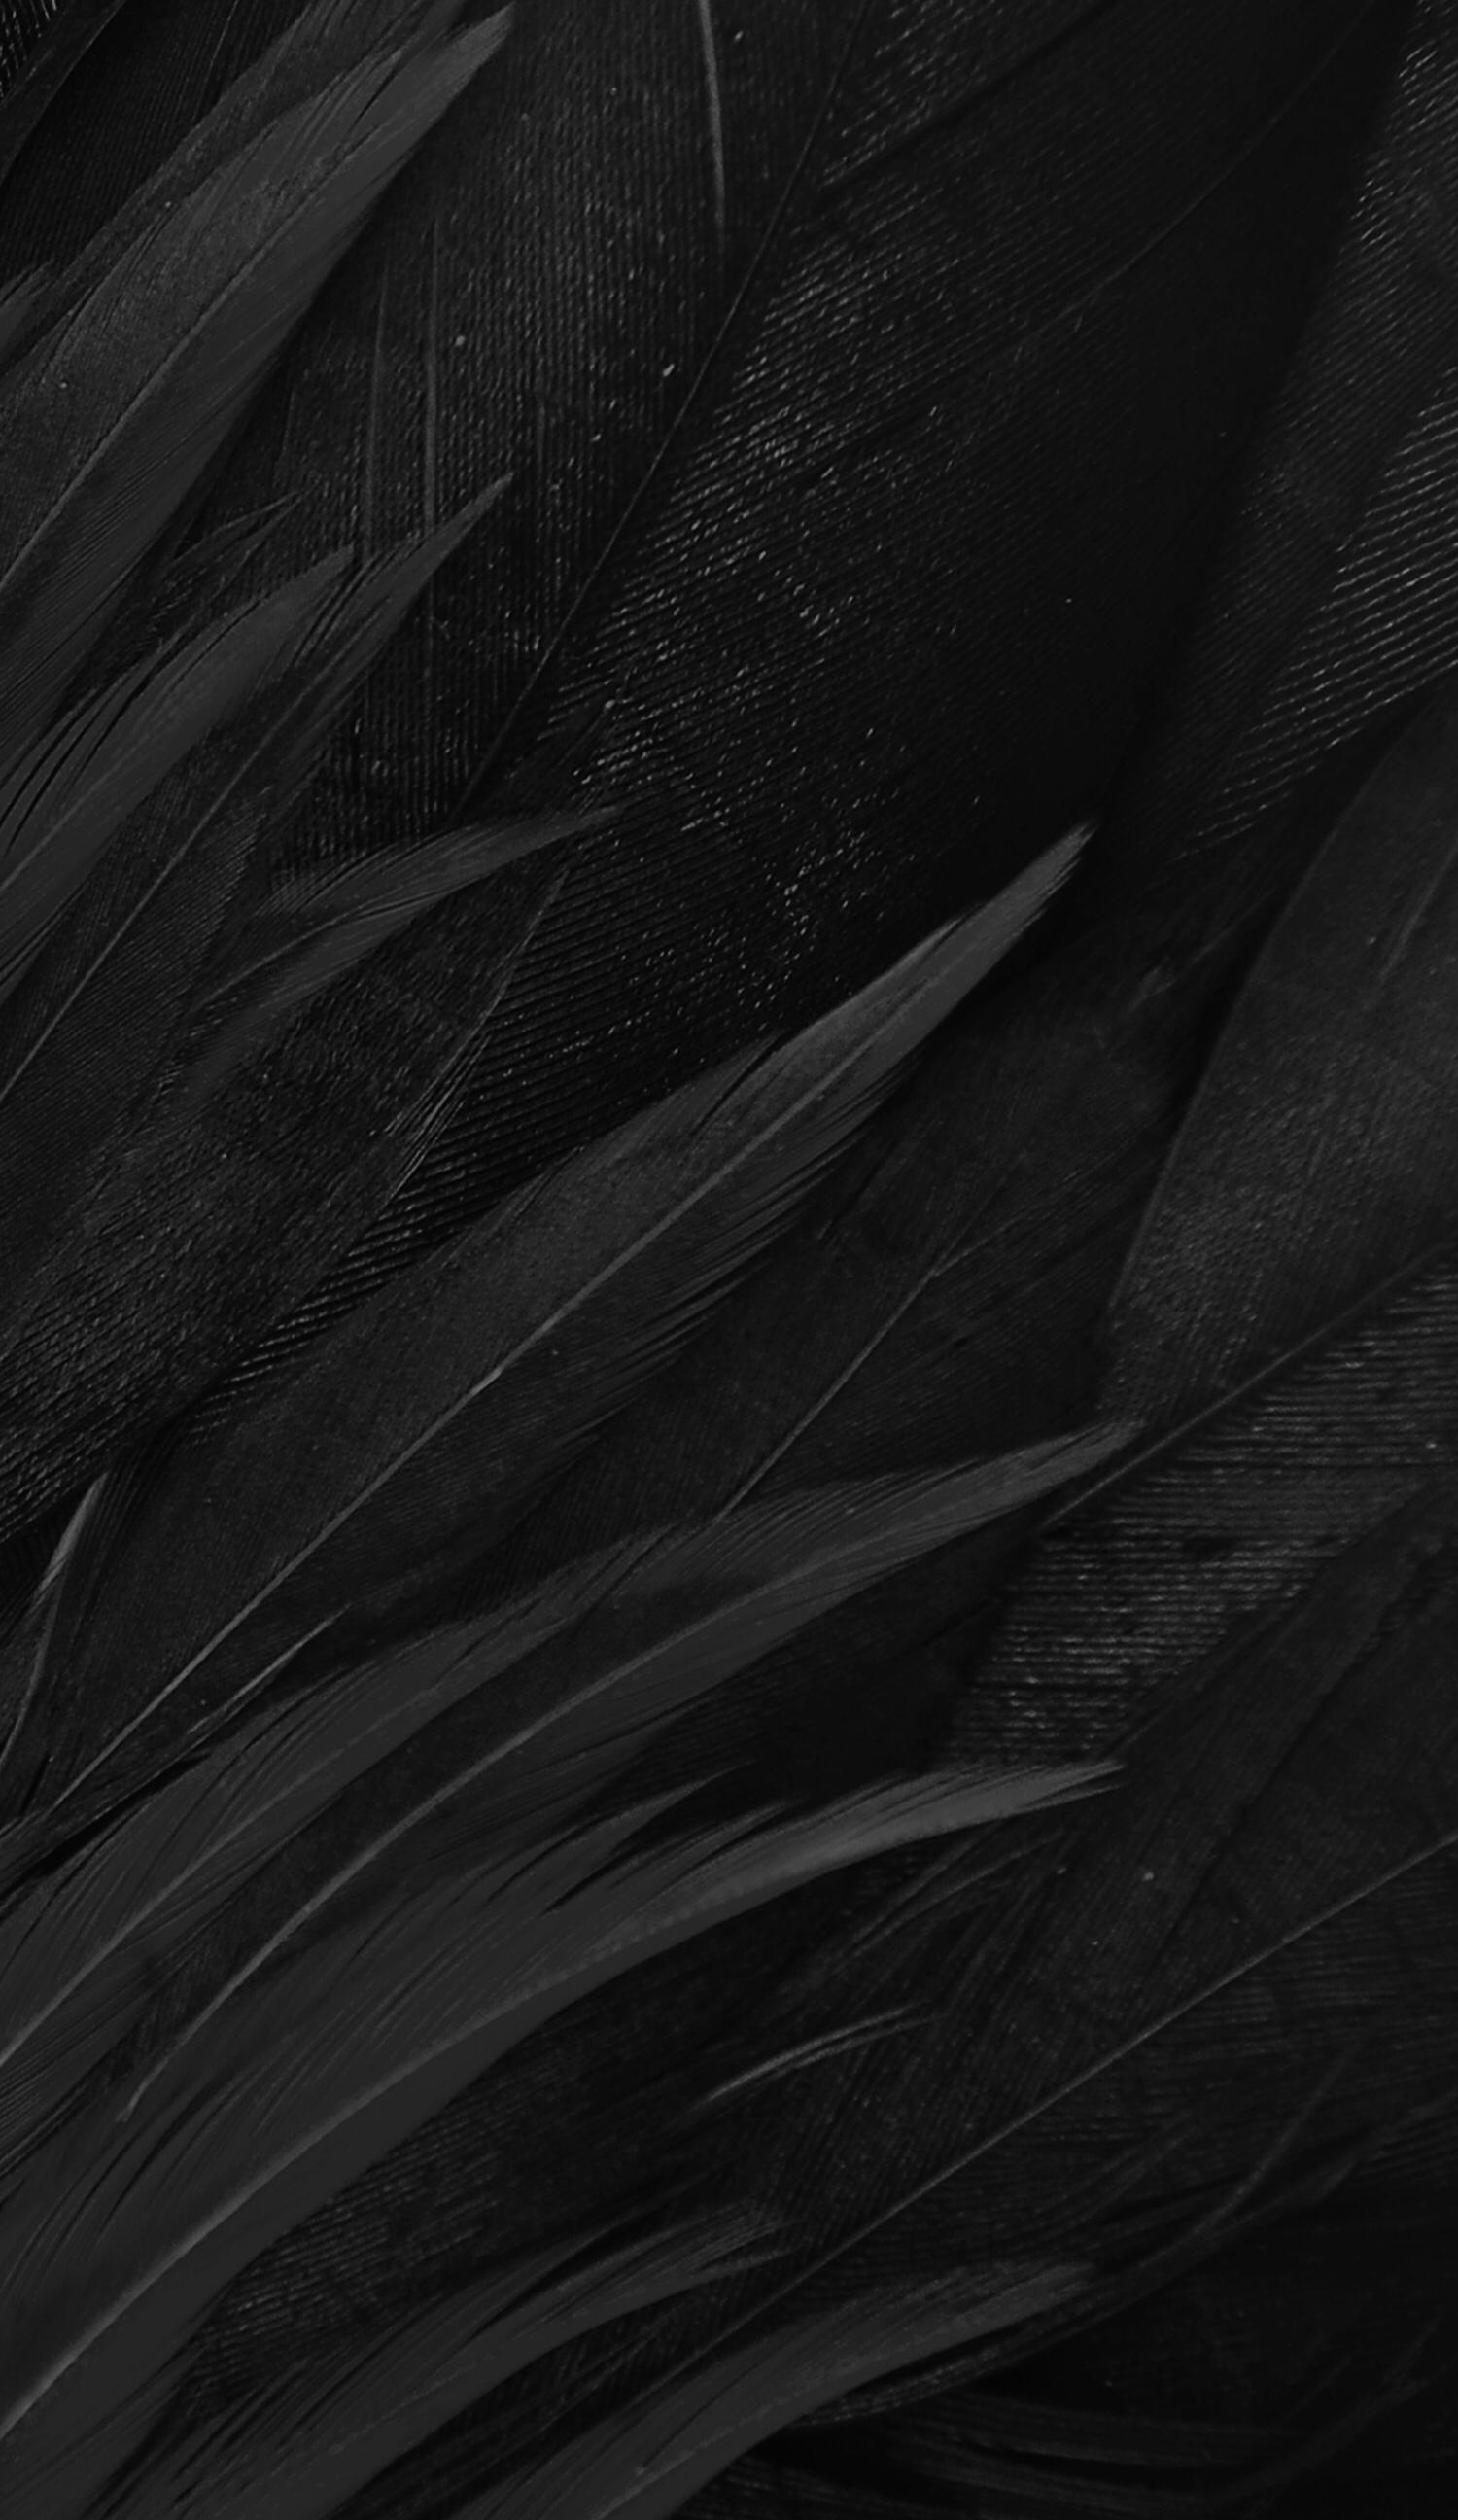 Pin By Maria Federico On Fondos Black Wallpaper Matte Black Background Black Wallpaper Iphone